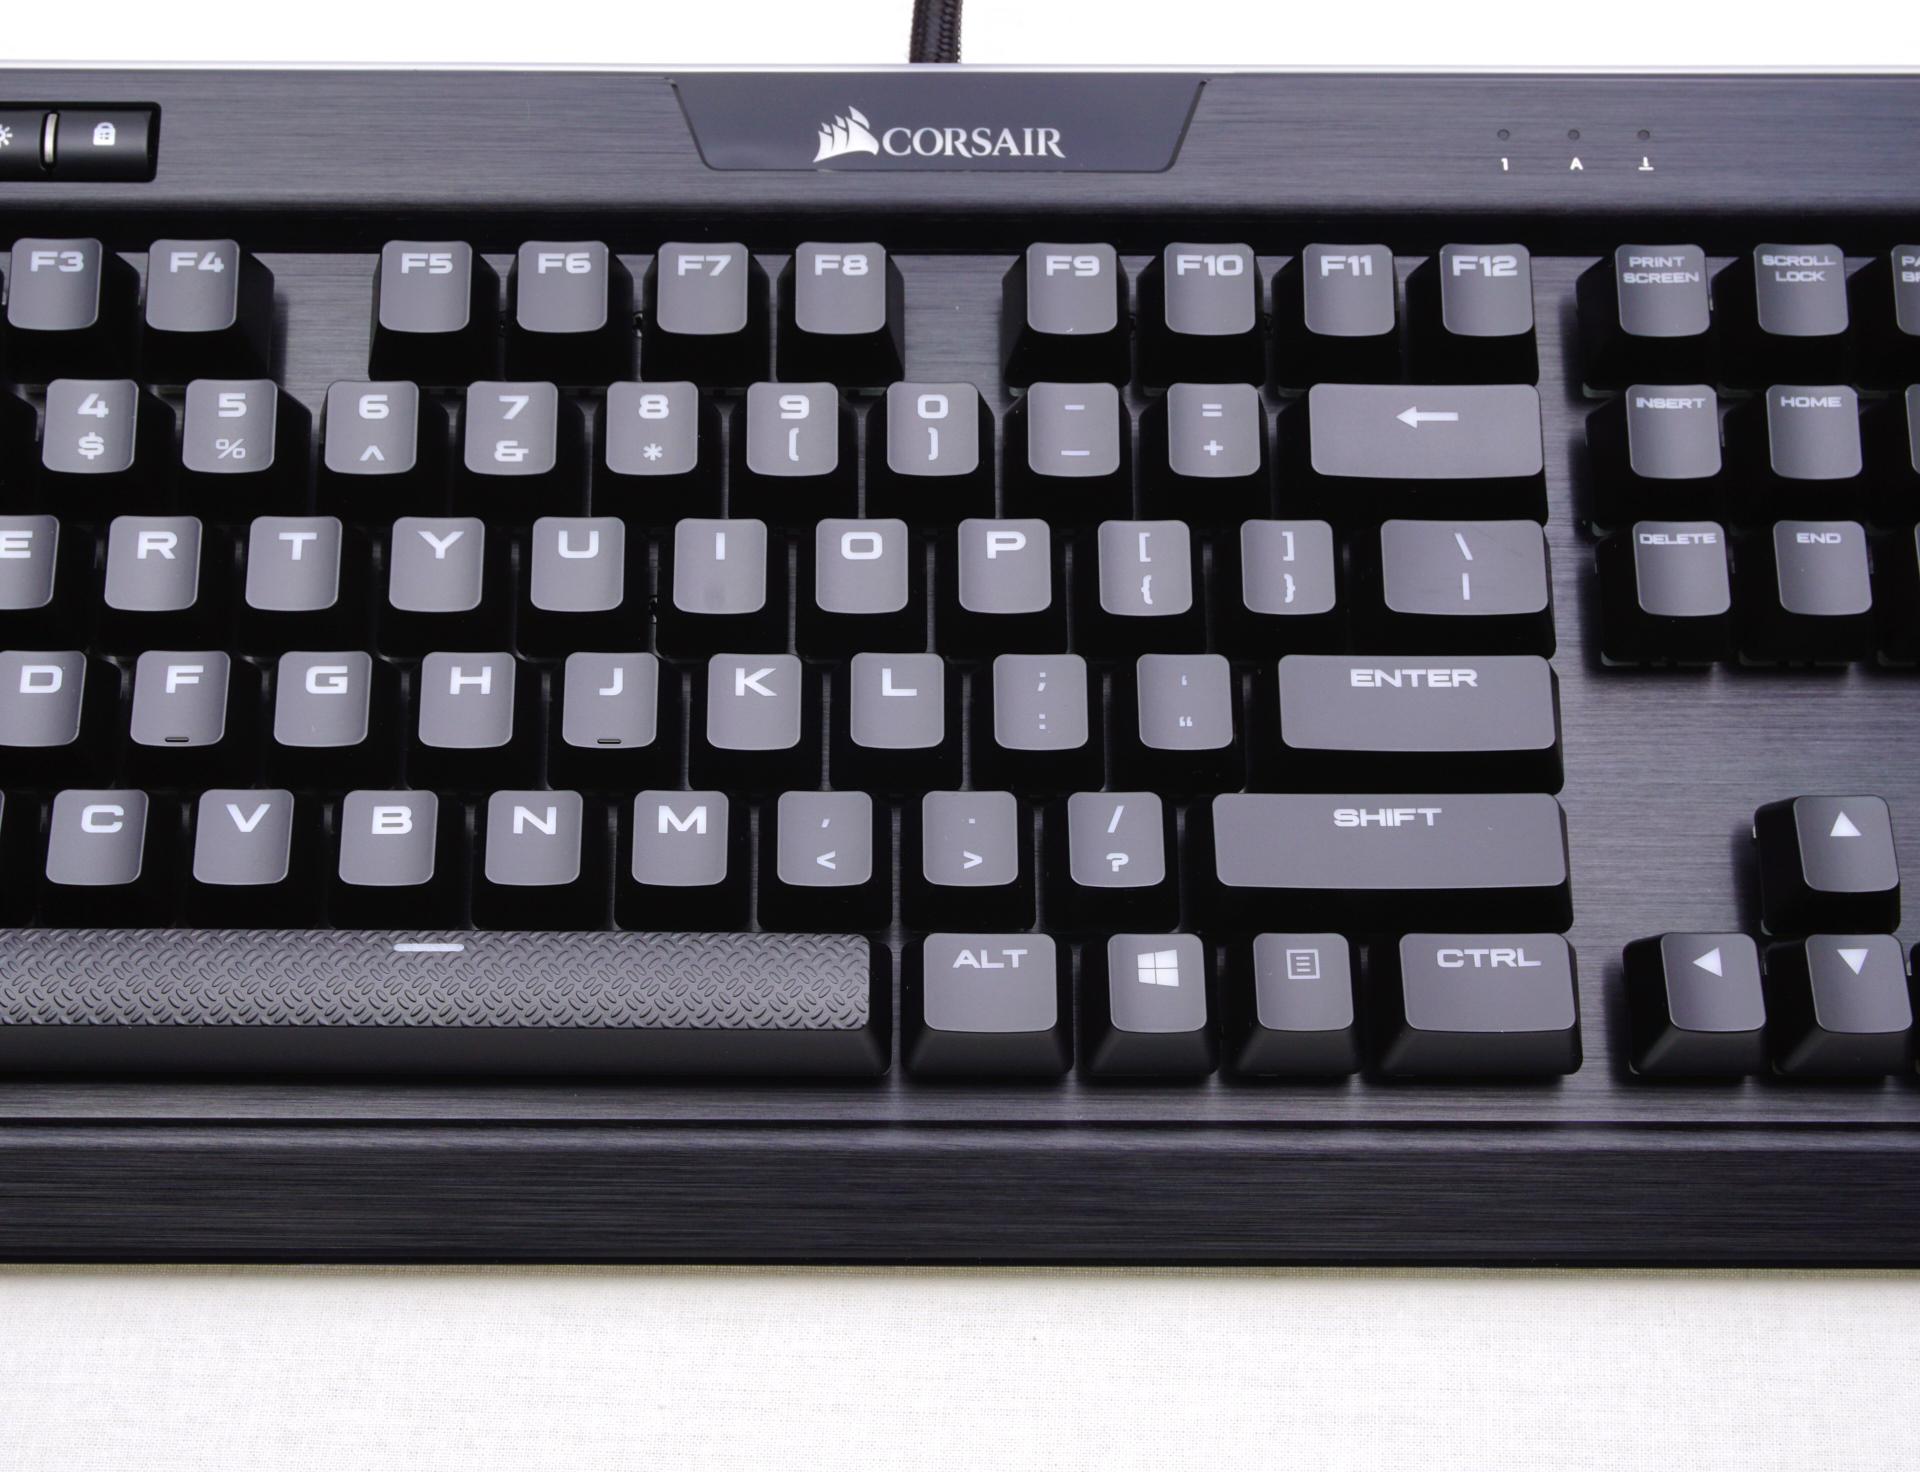 The Corsair K95 RGB Platinum Mechanical Gaming Keyboard - The